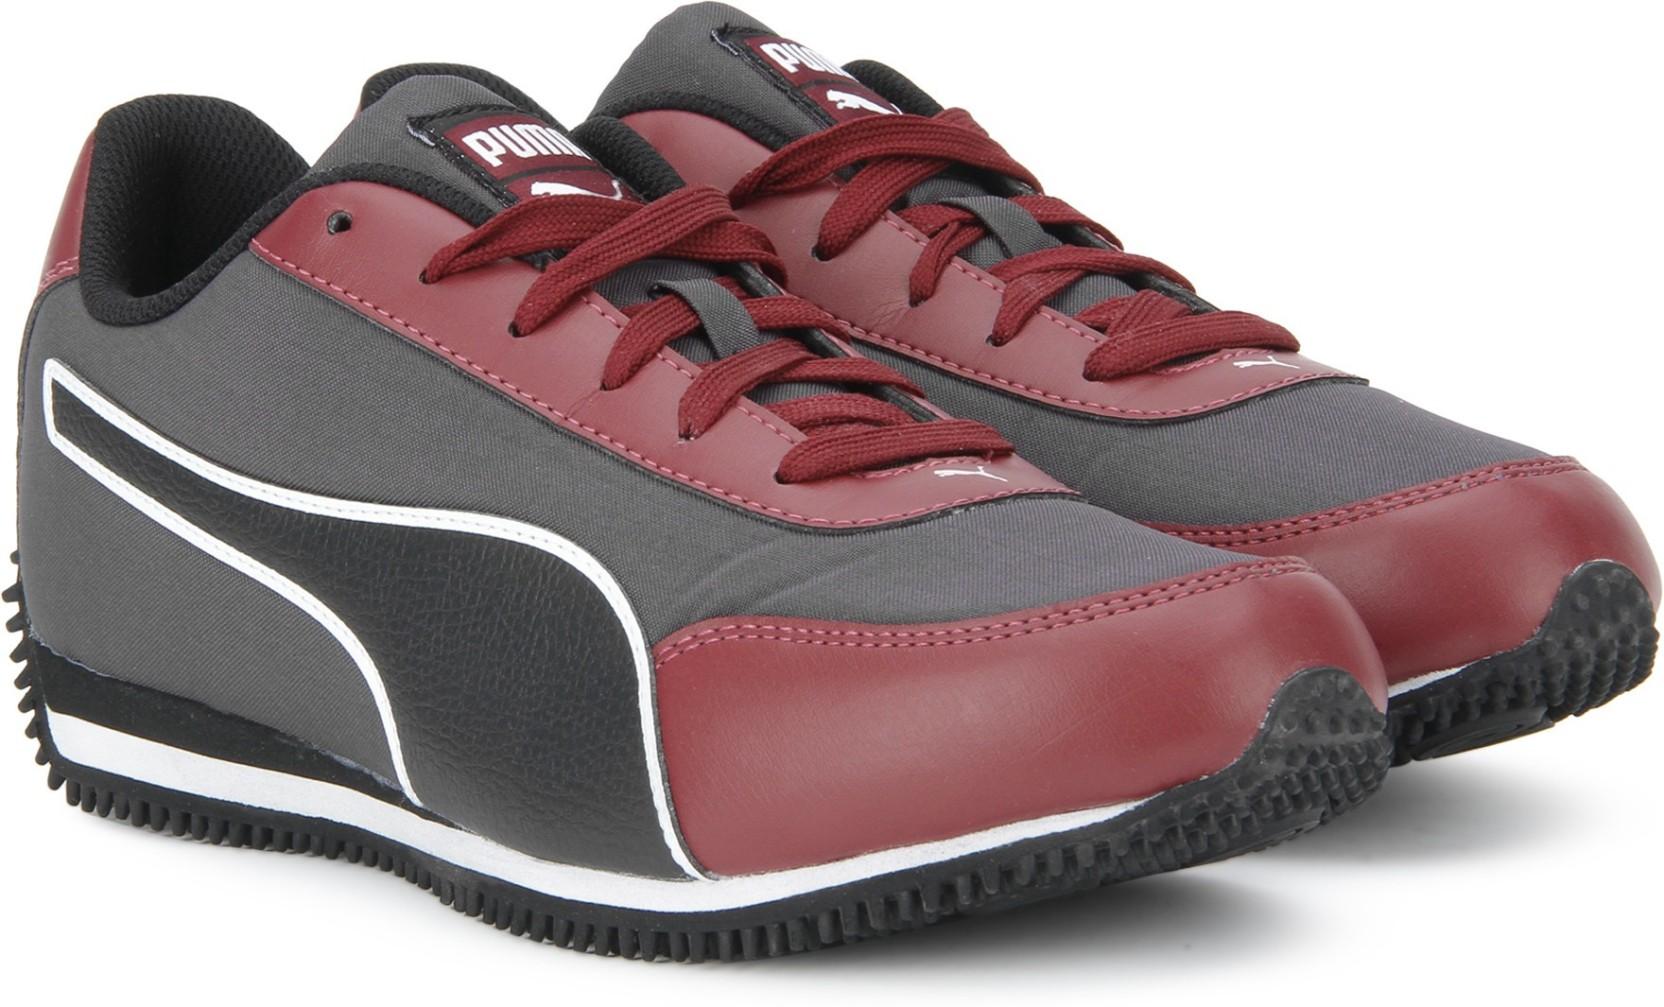 78158de1ef8f59 Puma Halley IDP Running Shoes For Men - Buy Asphalt-Tibetan Red ...